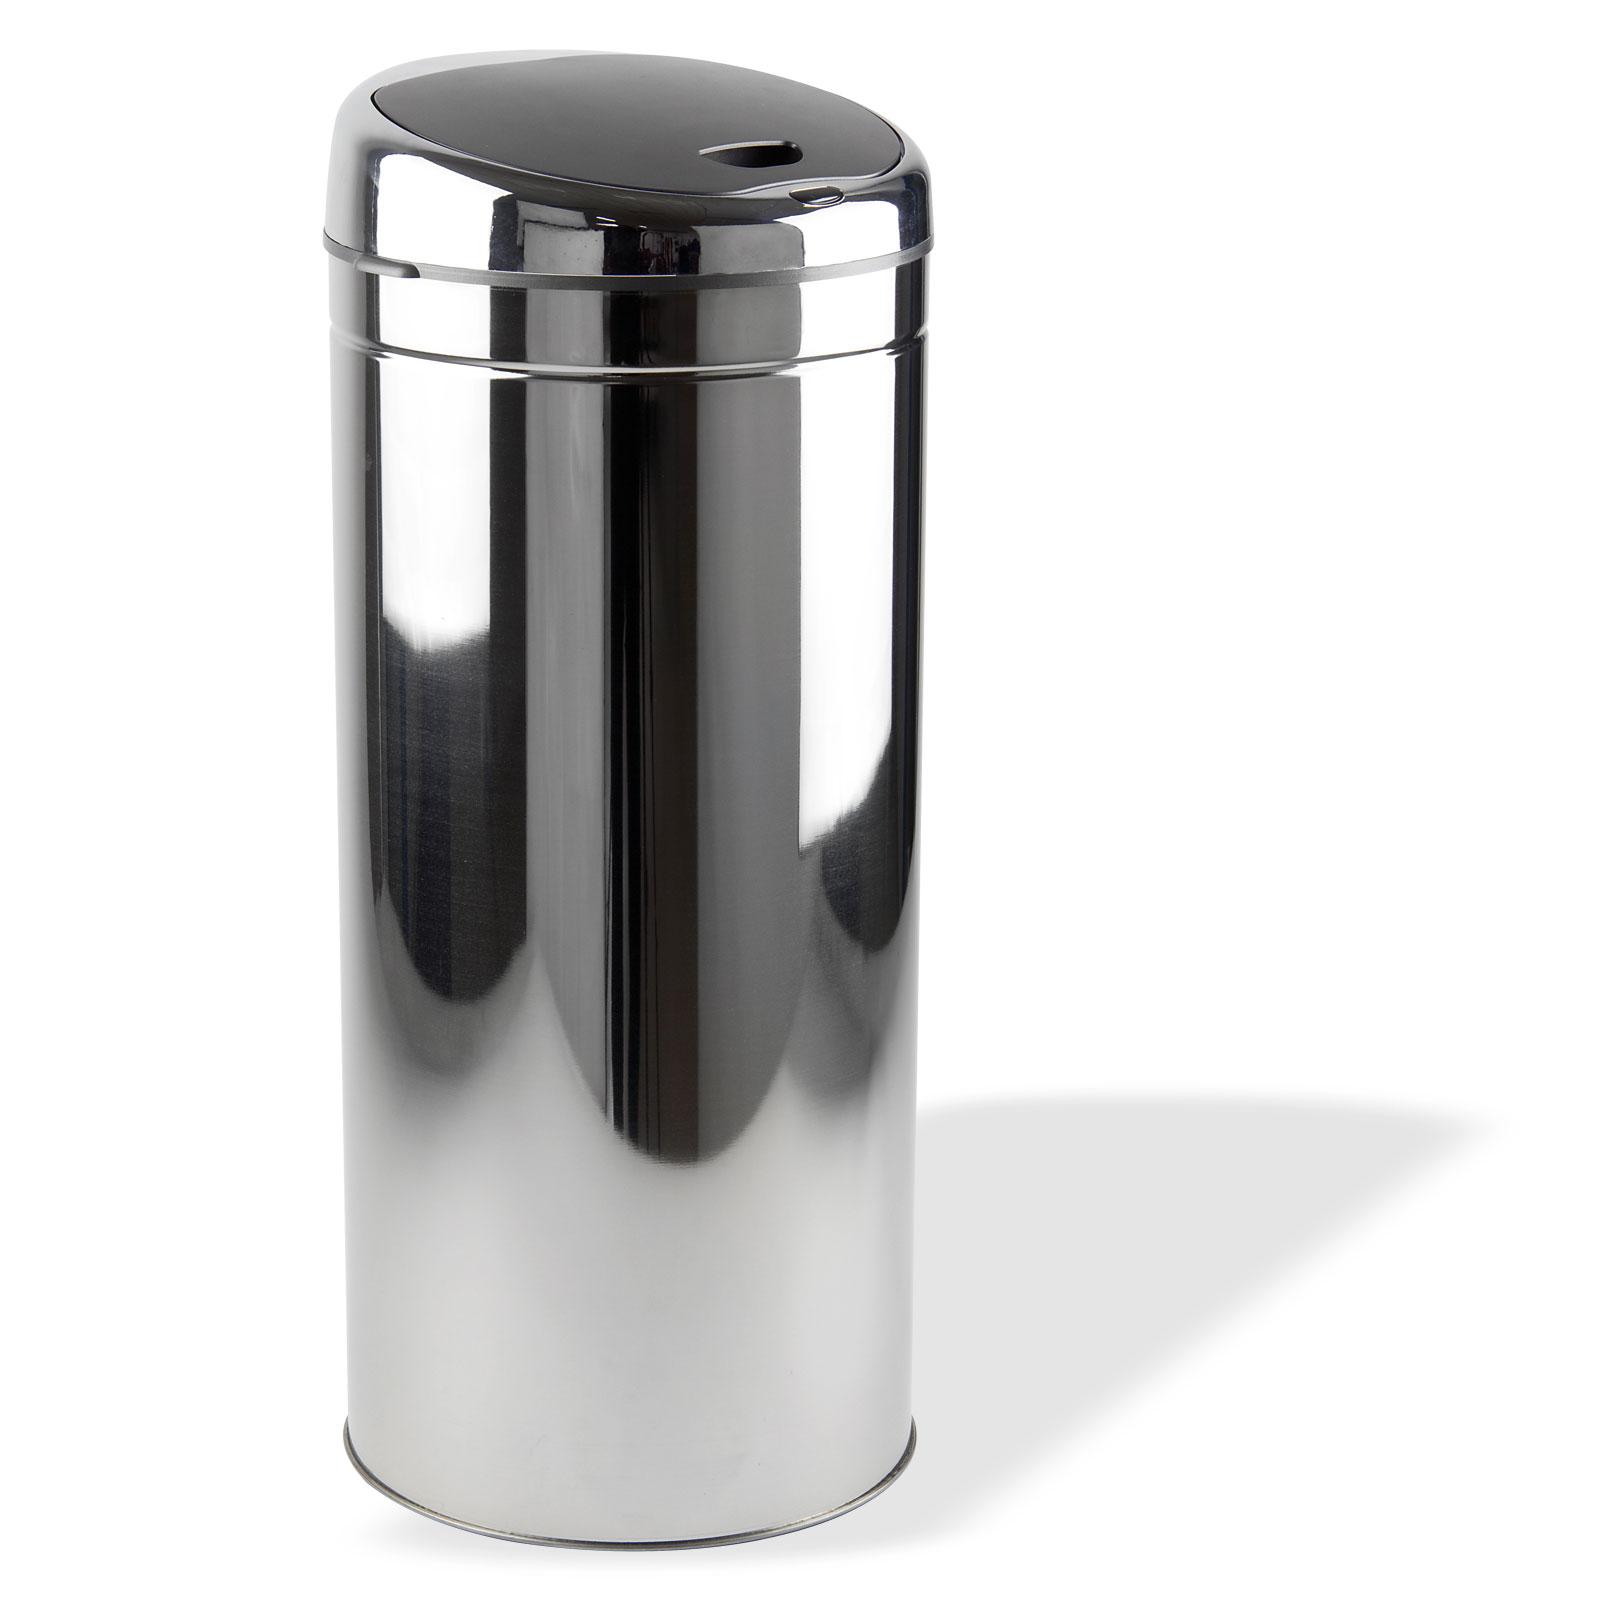 15122 automatik m lleimer mit sensor infrarot abfalleimer 50 liter ebay. Black Bedroom Furniture Sets. Home Design Ideas